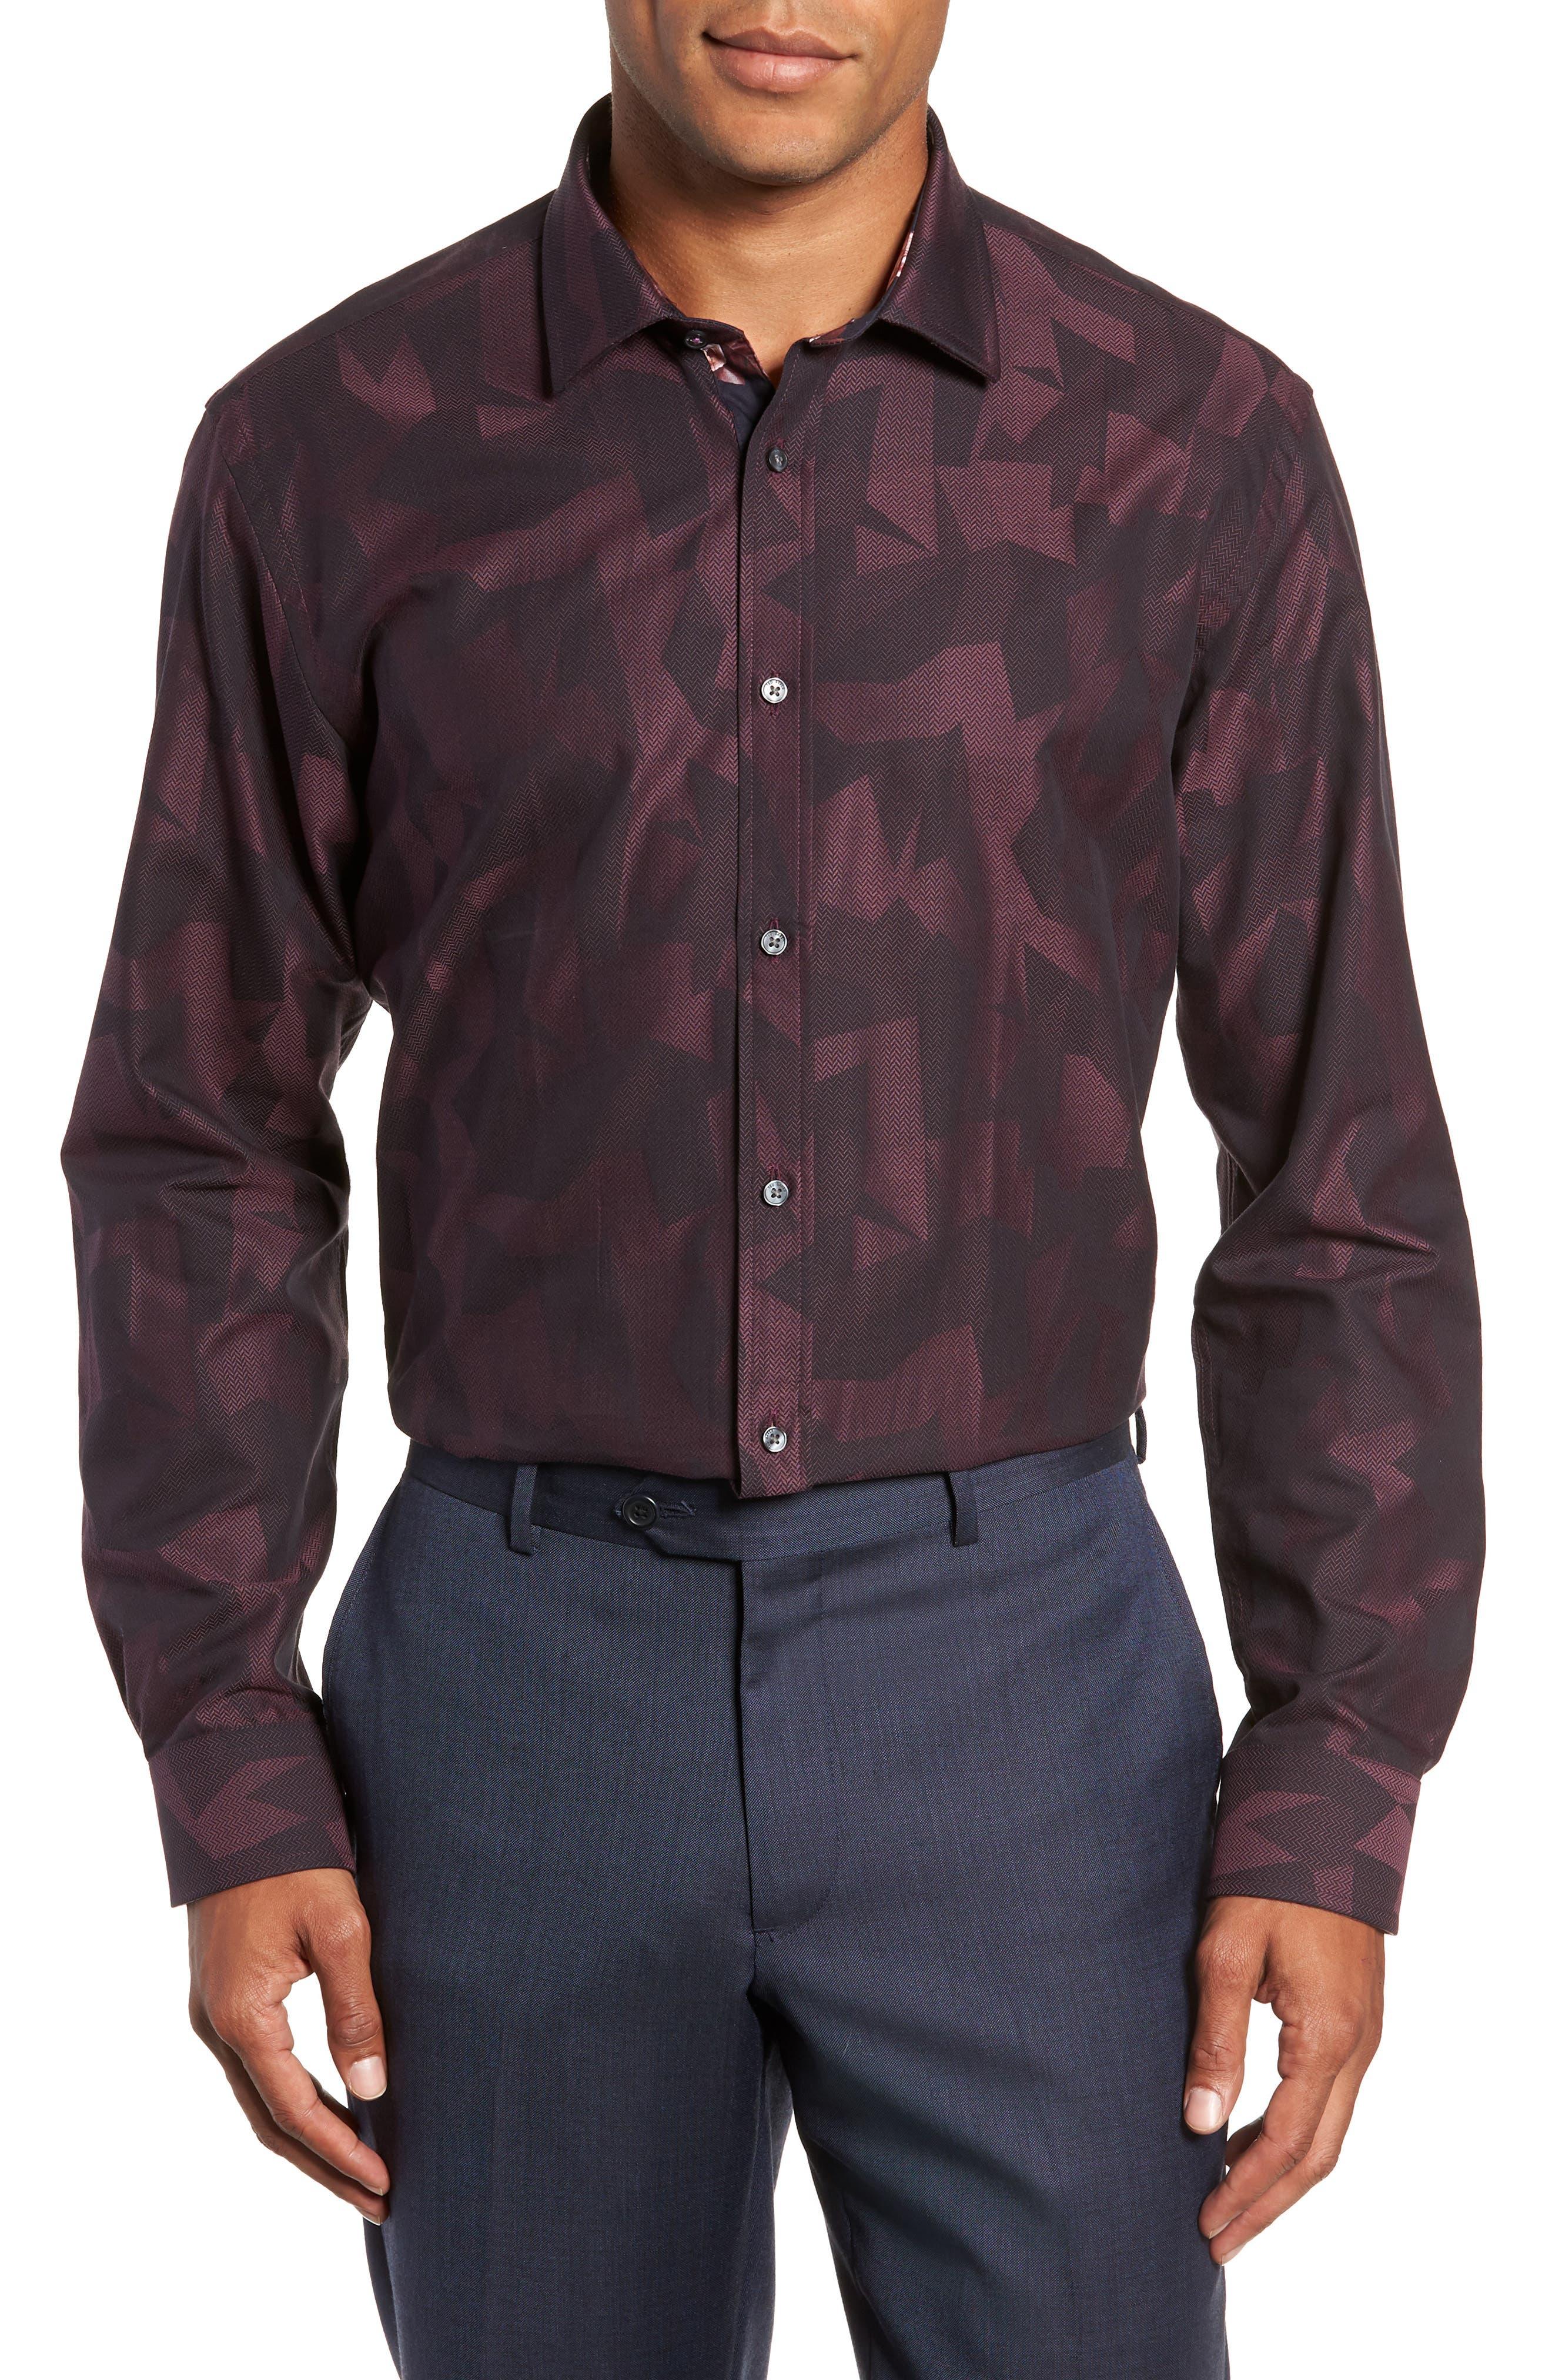 Slissum Slim Fit Print Dress Shirt,                             Main thumbnail 1, color,                             DARK RED